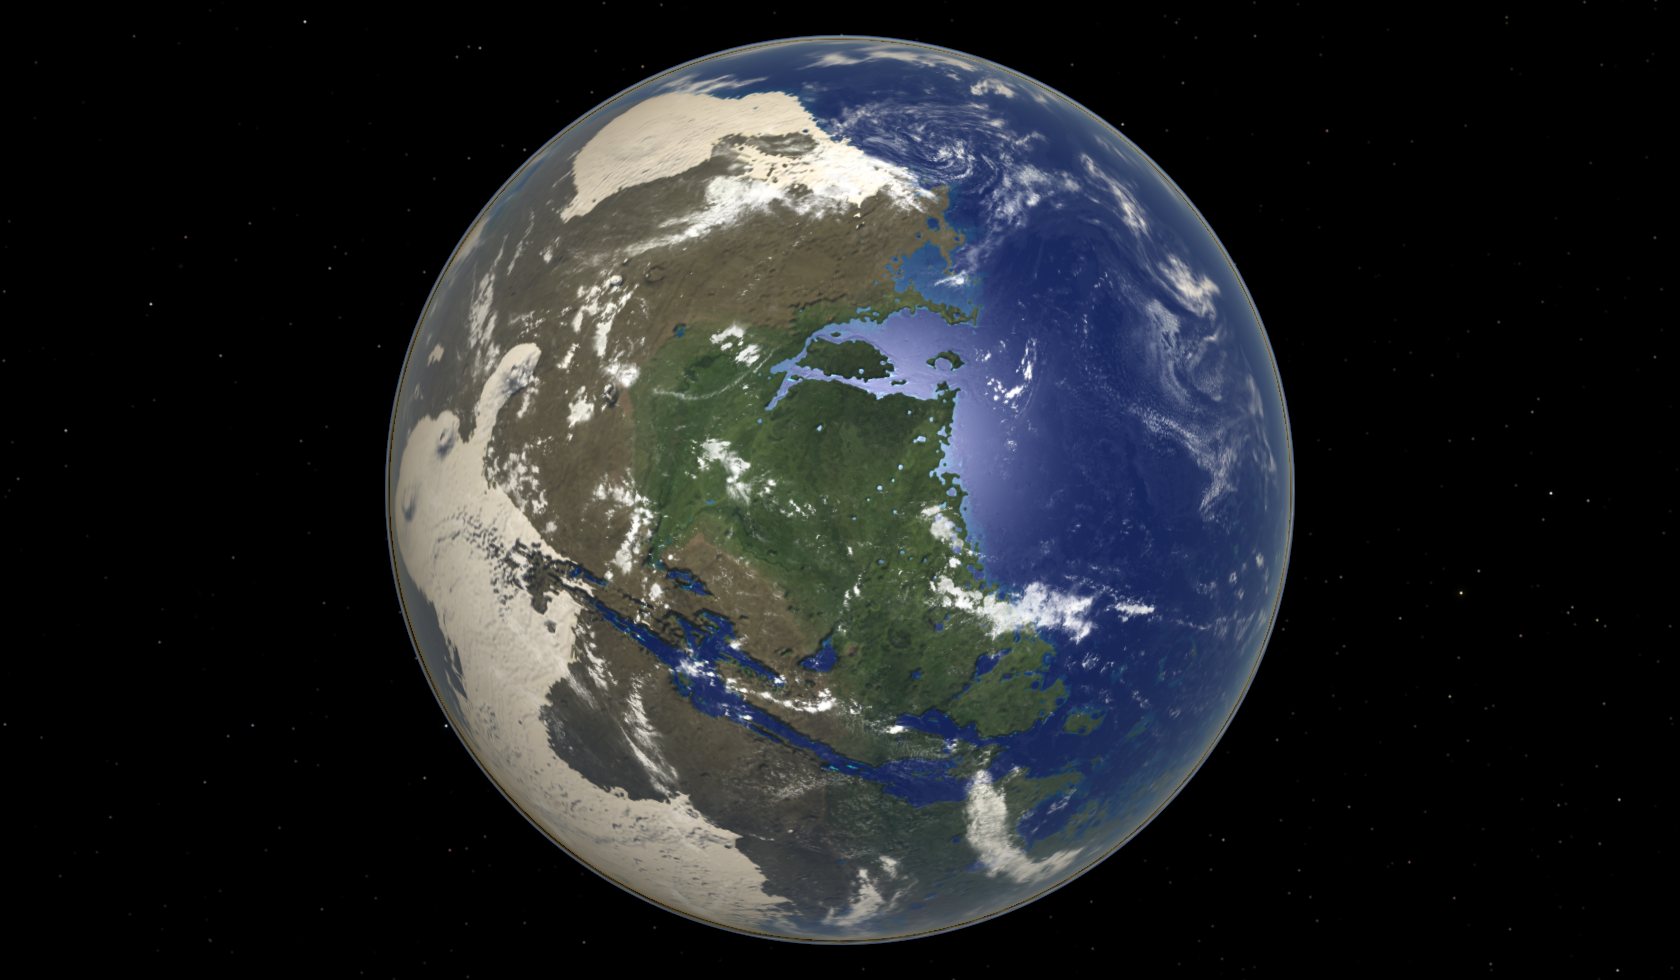 terraform mars planet - photo #17